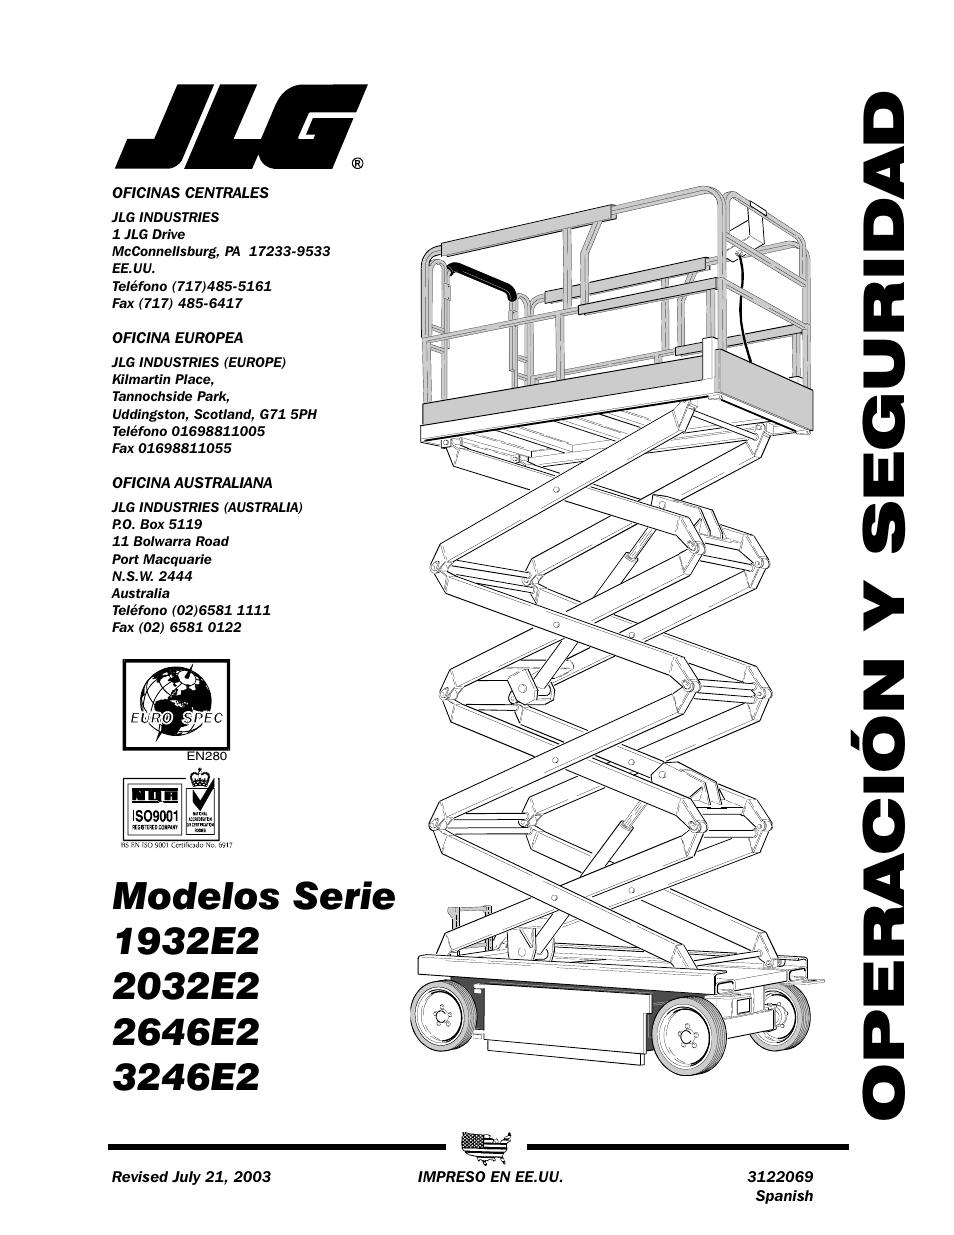 hight resolution of jlg 3246e2 operator manual manual del usuario p ginas 44 rh pdfmanuales com jlg 1932e2 batteries